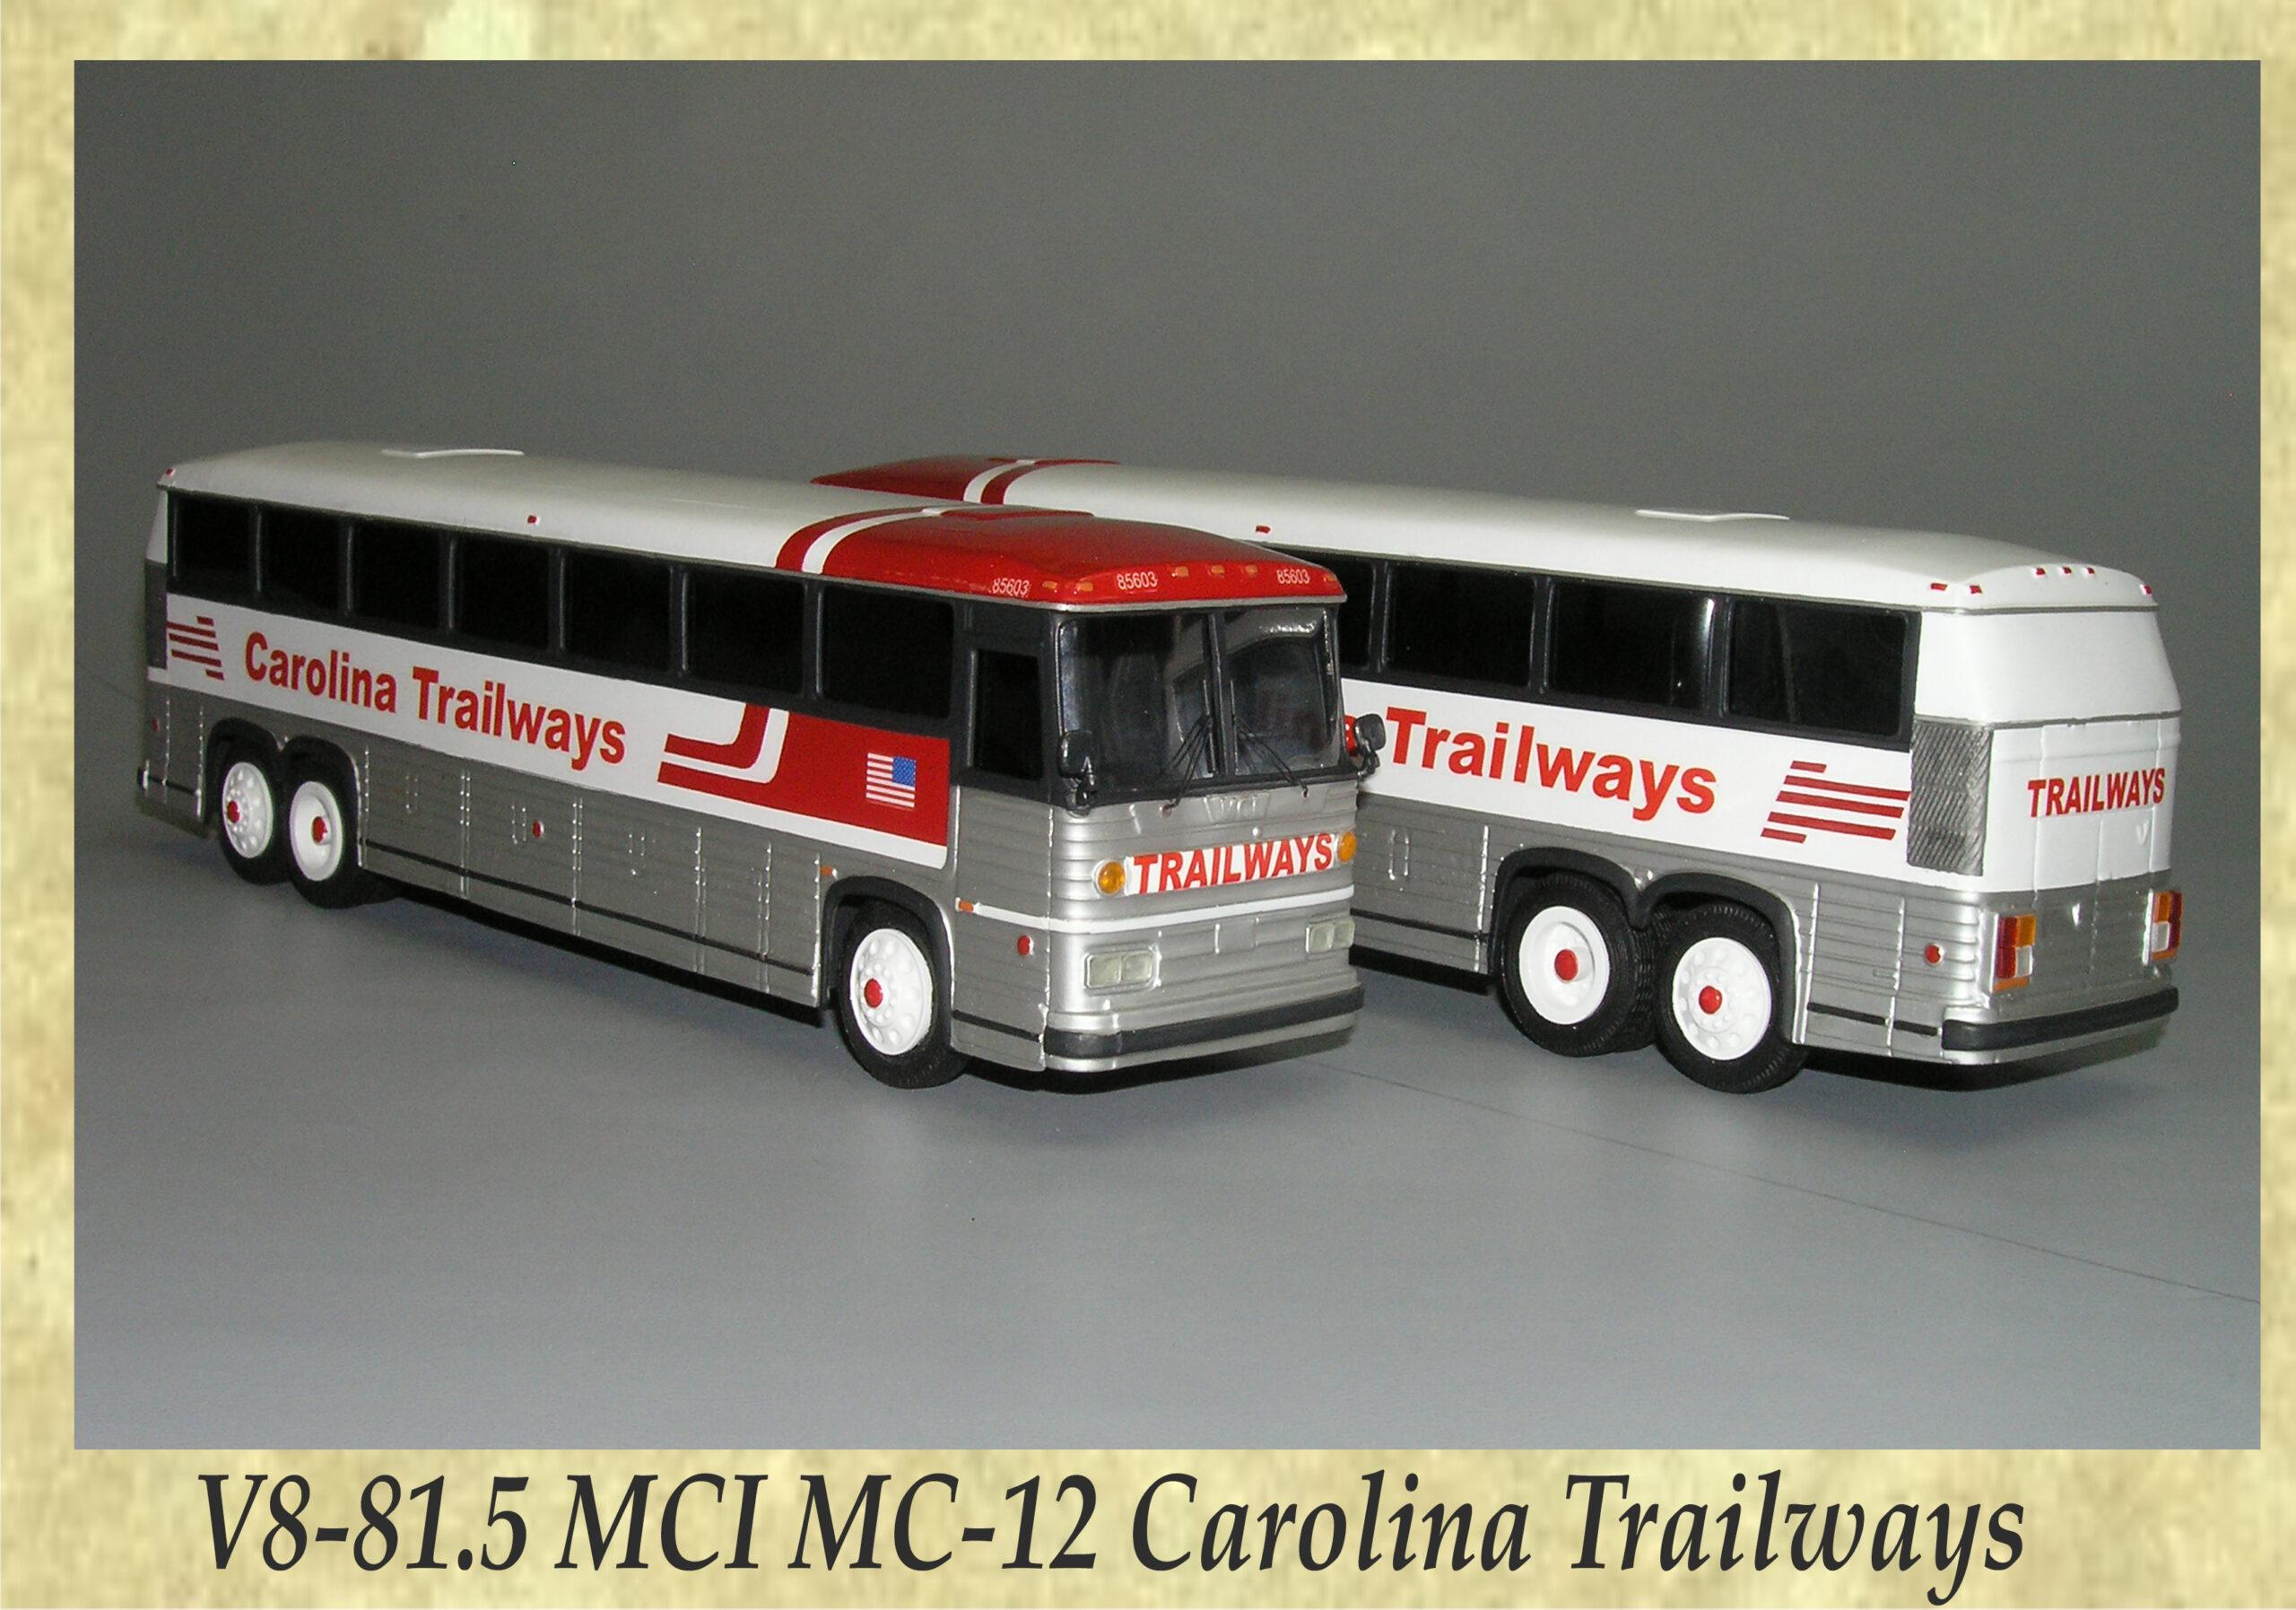 V8-81.5 MCI MC-12 Carolina Trailways